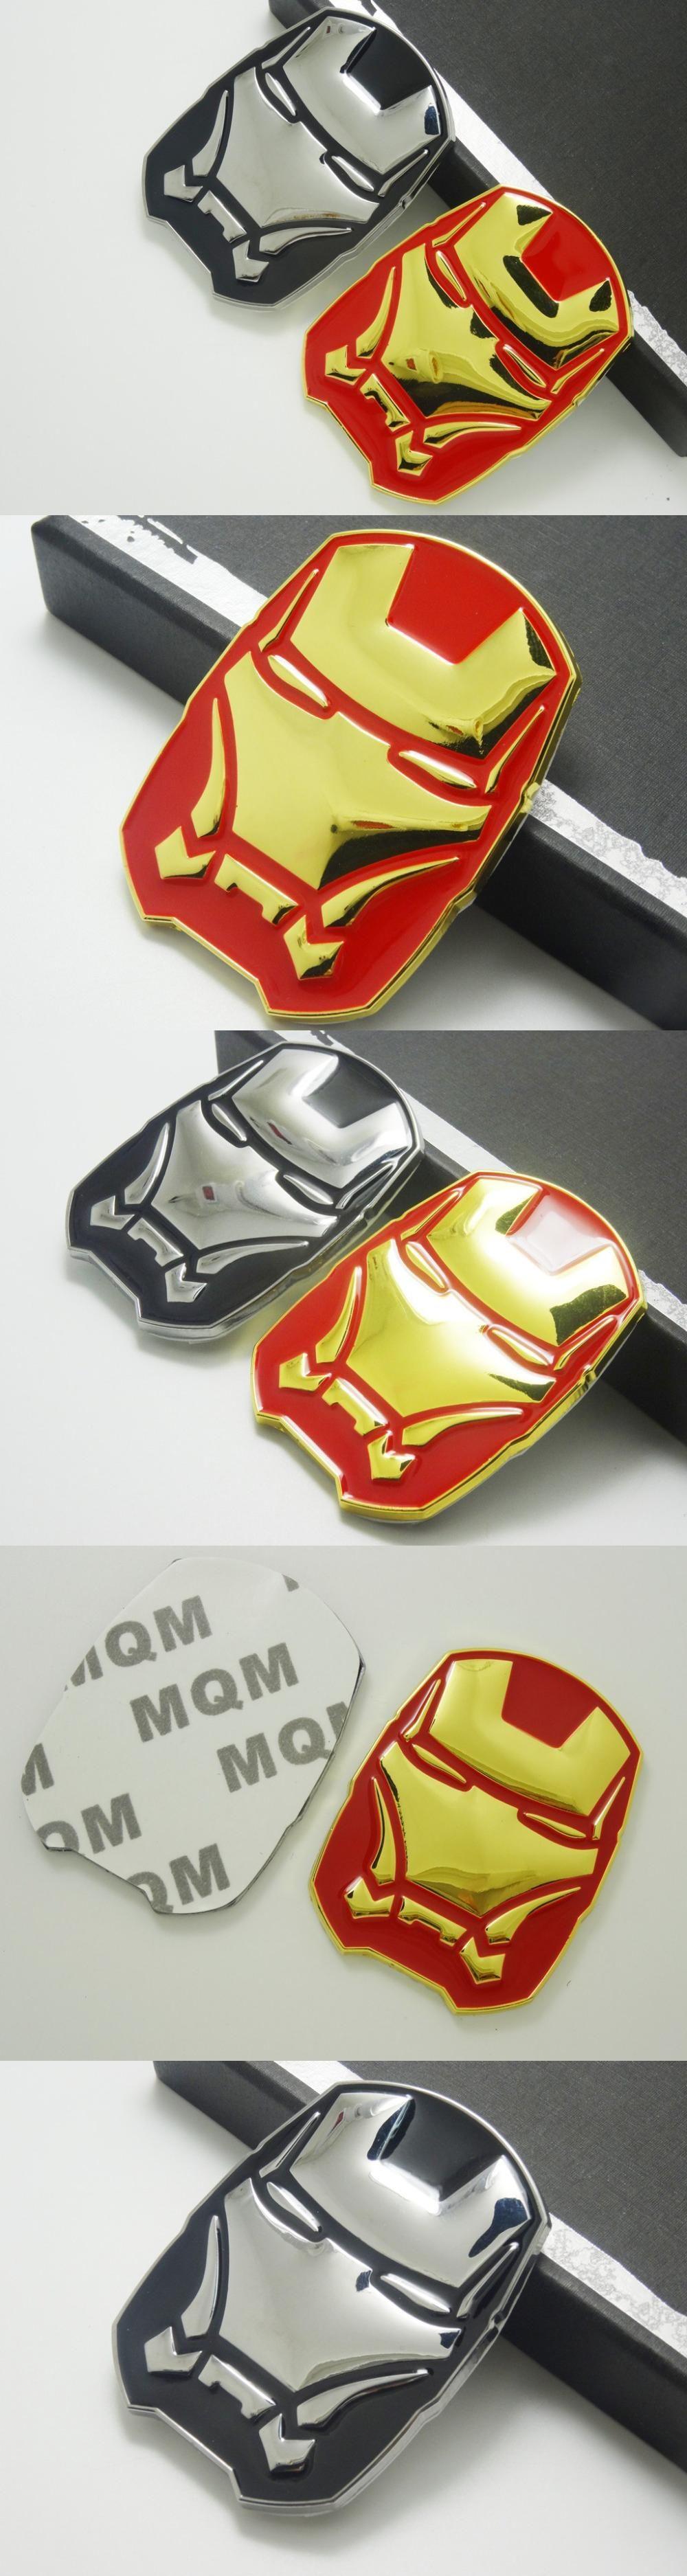 3d Chrome Metal Iron Man Car Emblem Stickers Logo Decoration The Avengers Car Styling Decals Exterior Accessories Exterior Accessories Car Emblem Accessories [ 3750 x 1000 Pixel ]